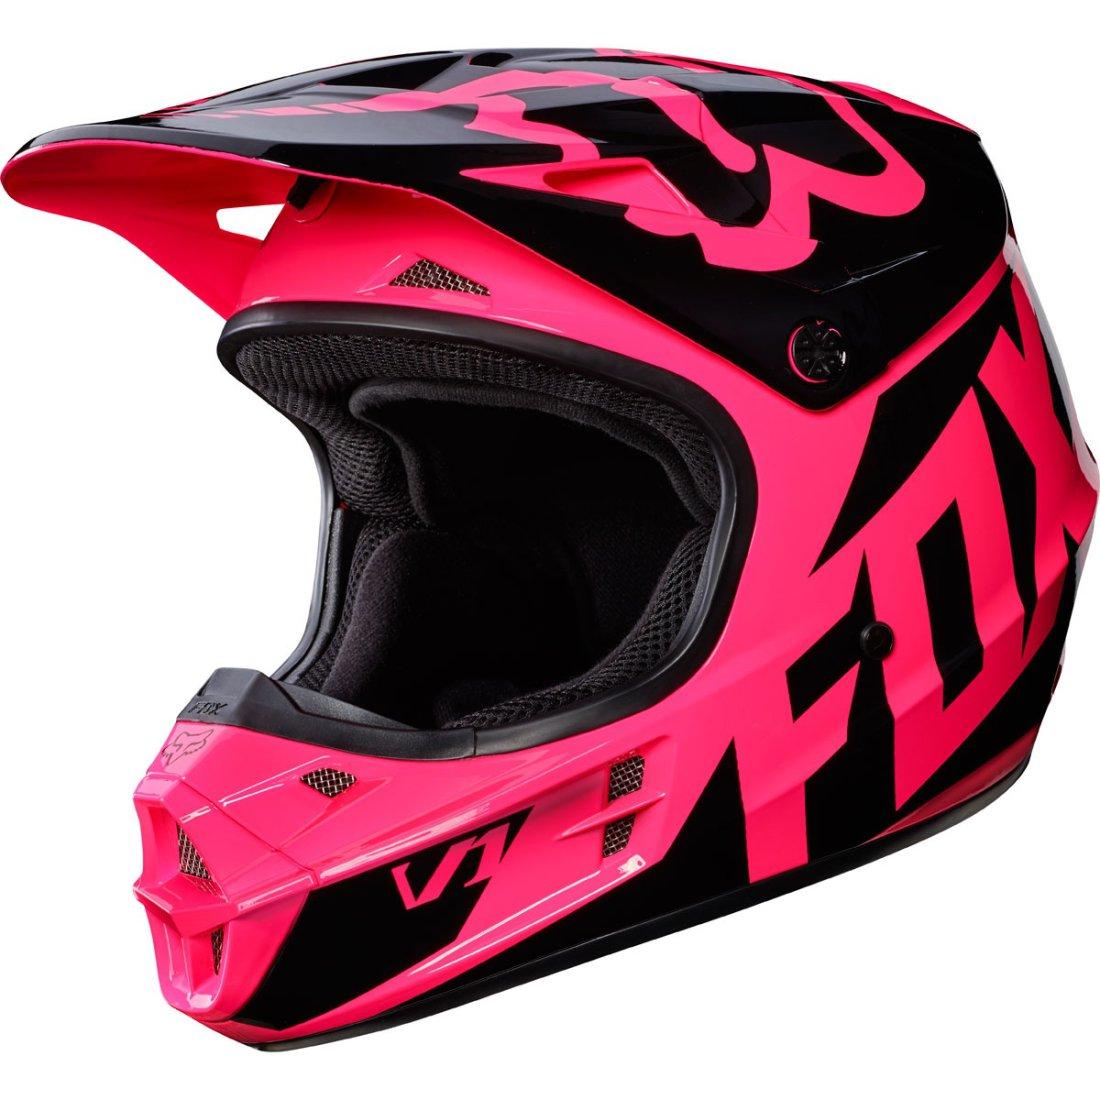 284 Cascos de motocross 74613695100